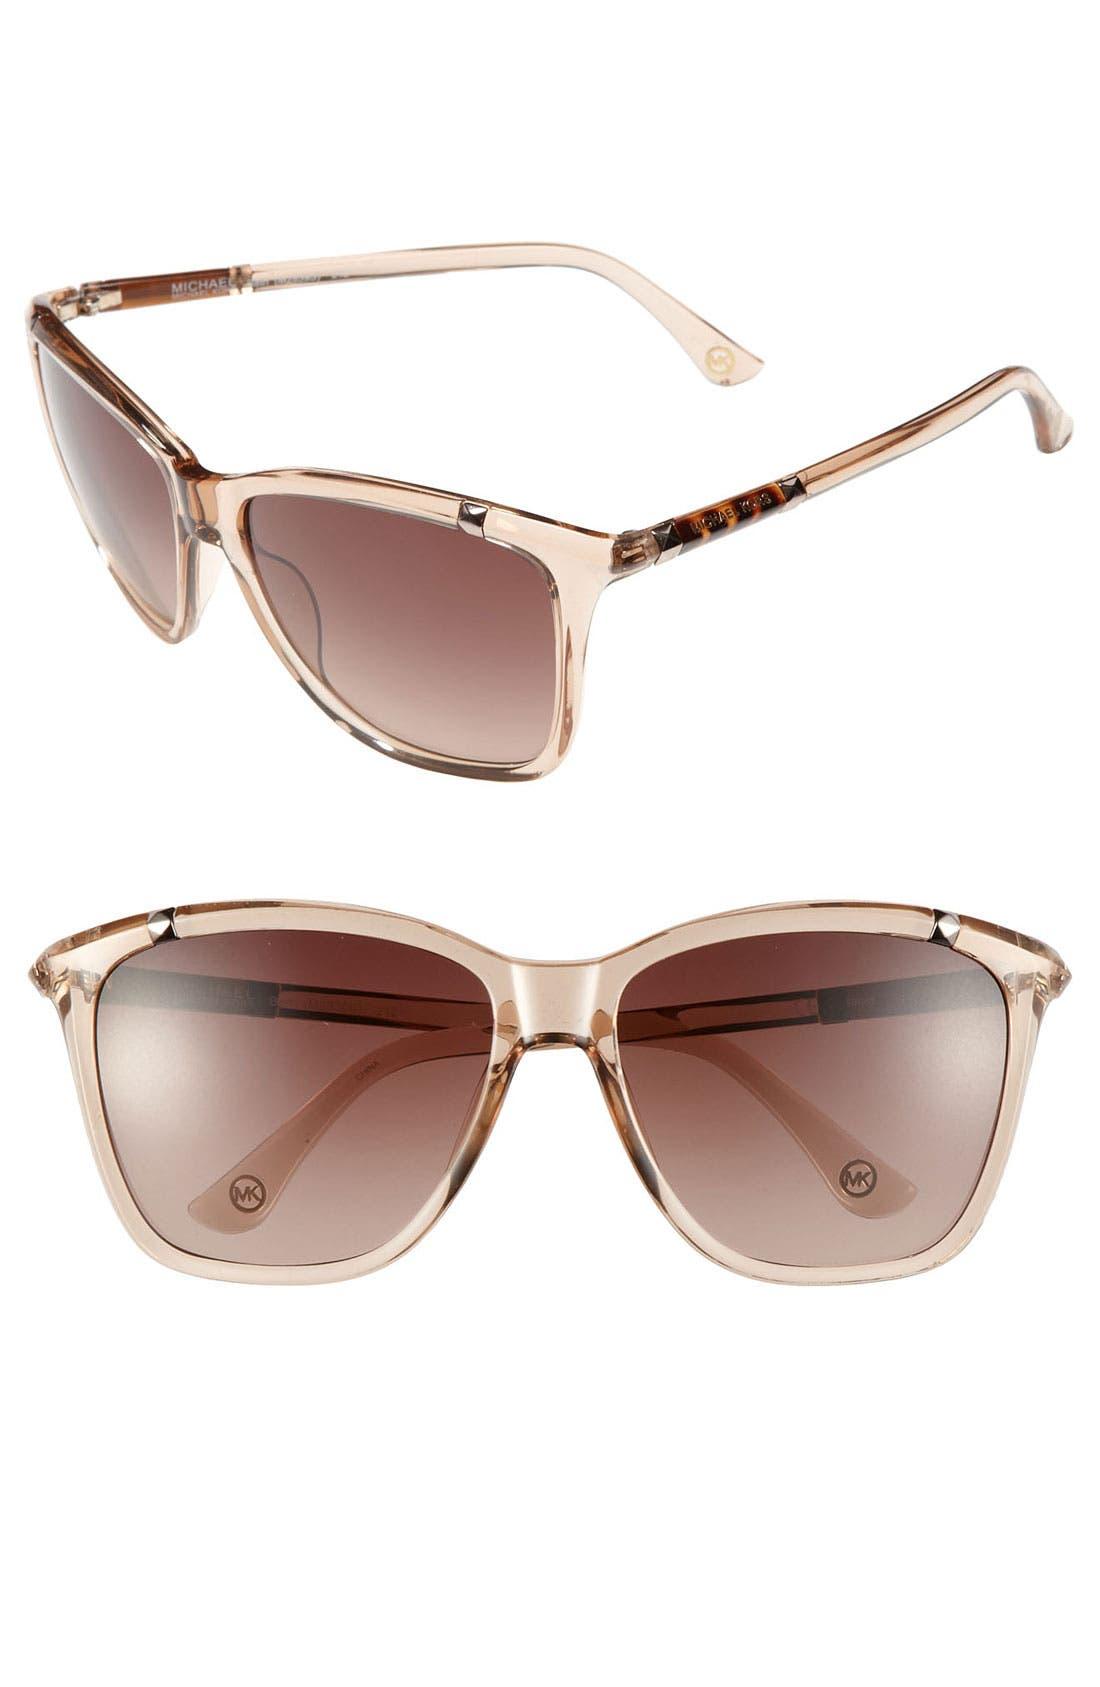 Main Image - MICHAEL Michael Kors 'Beth' 58mm Sunglasses